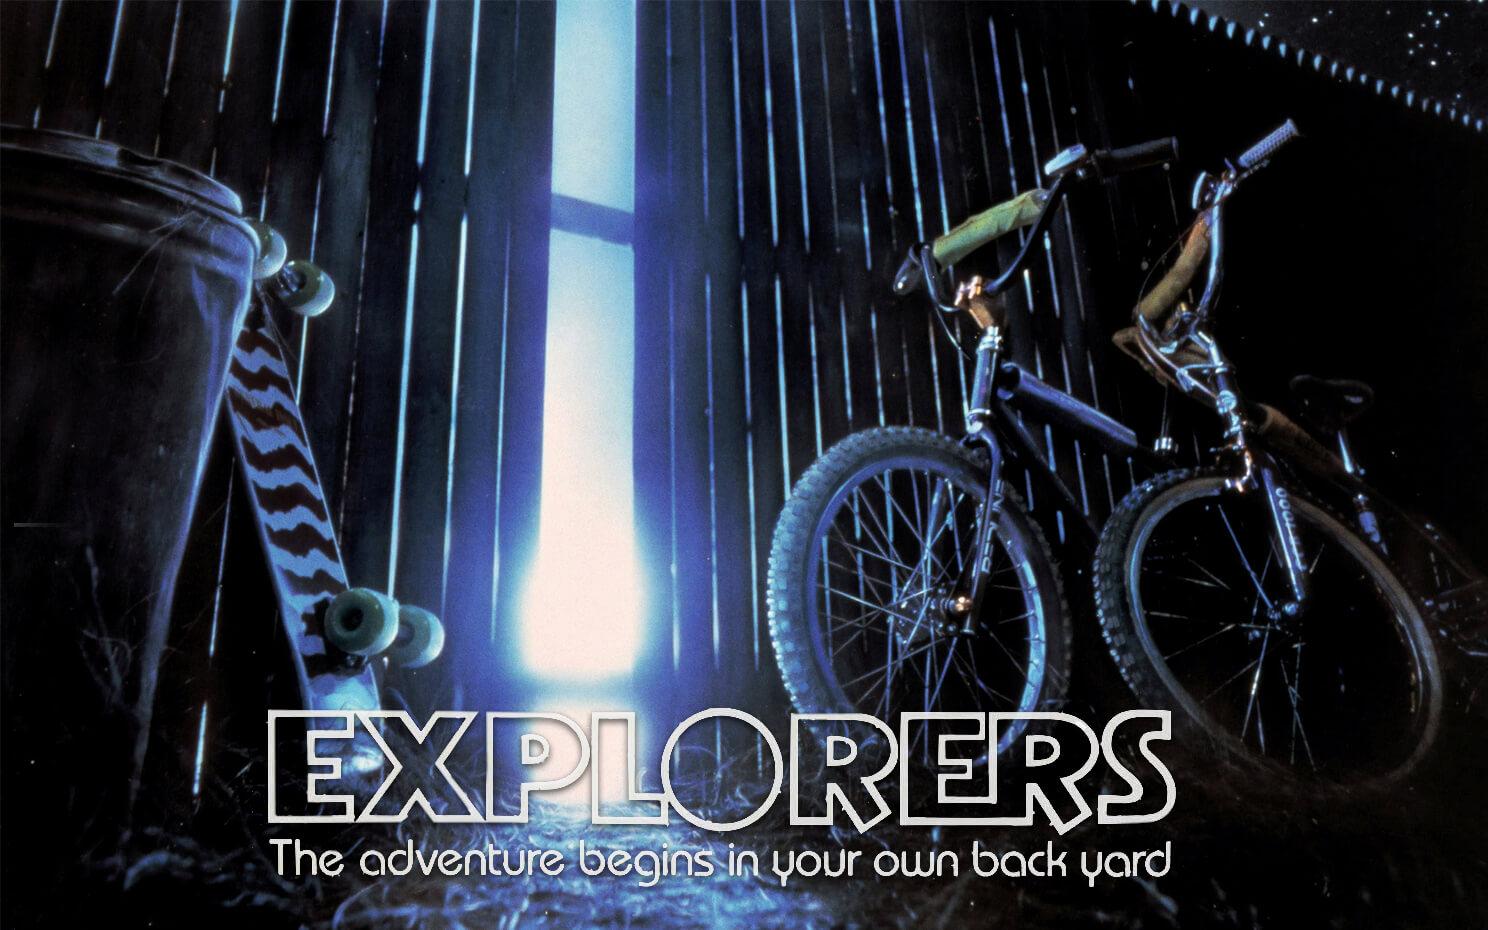 Explorers de Joe Dante